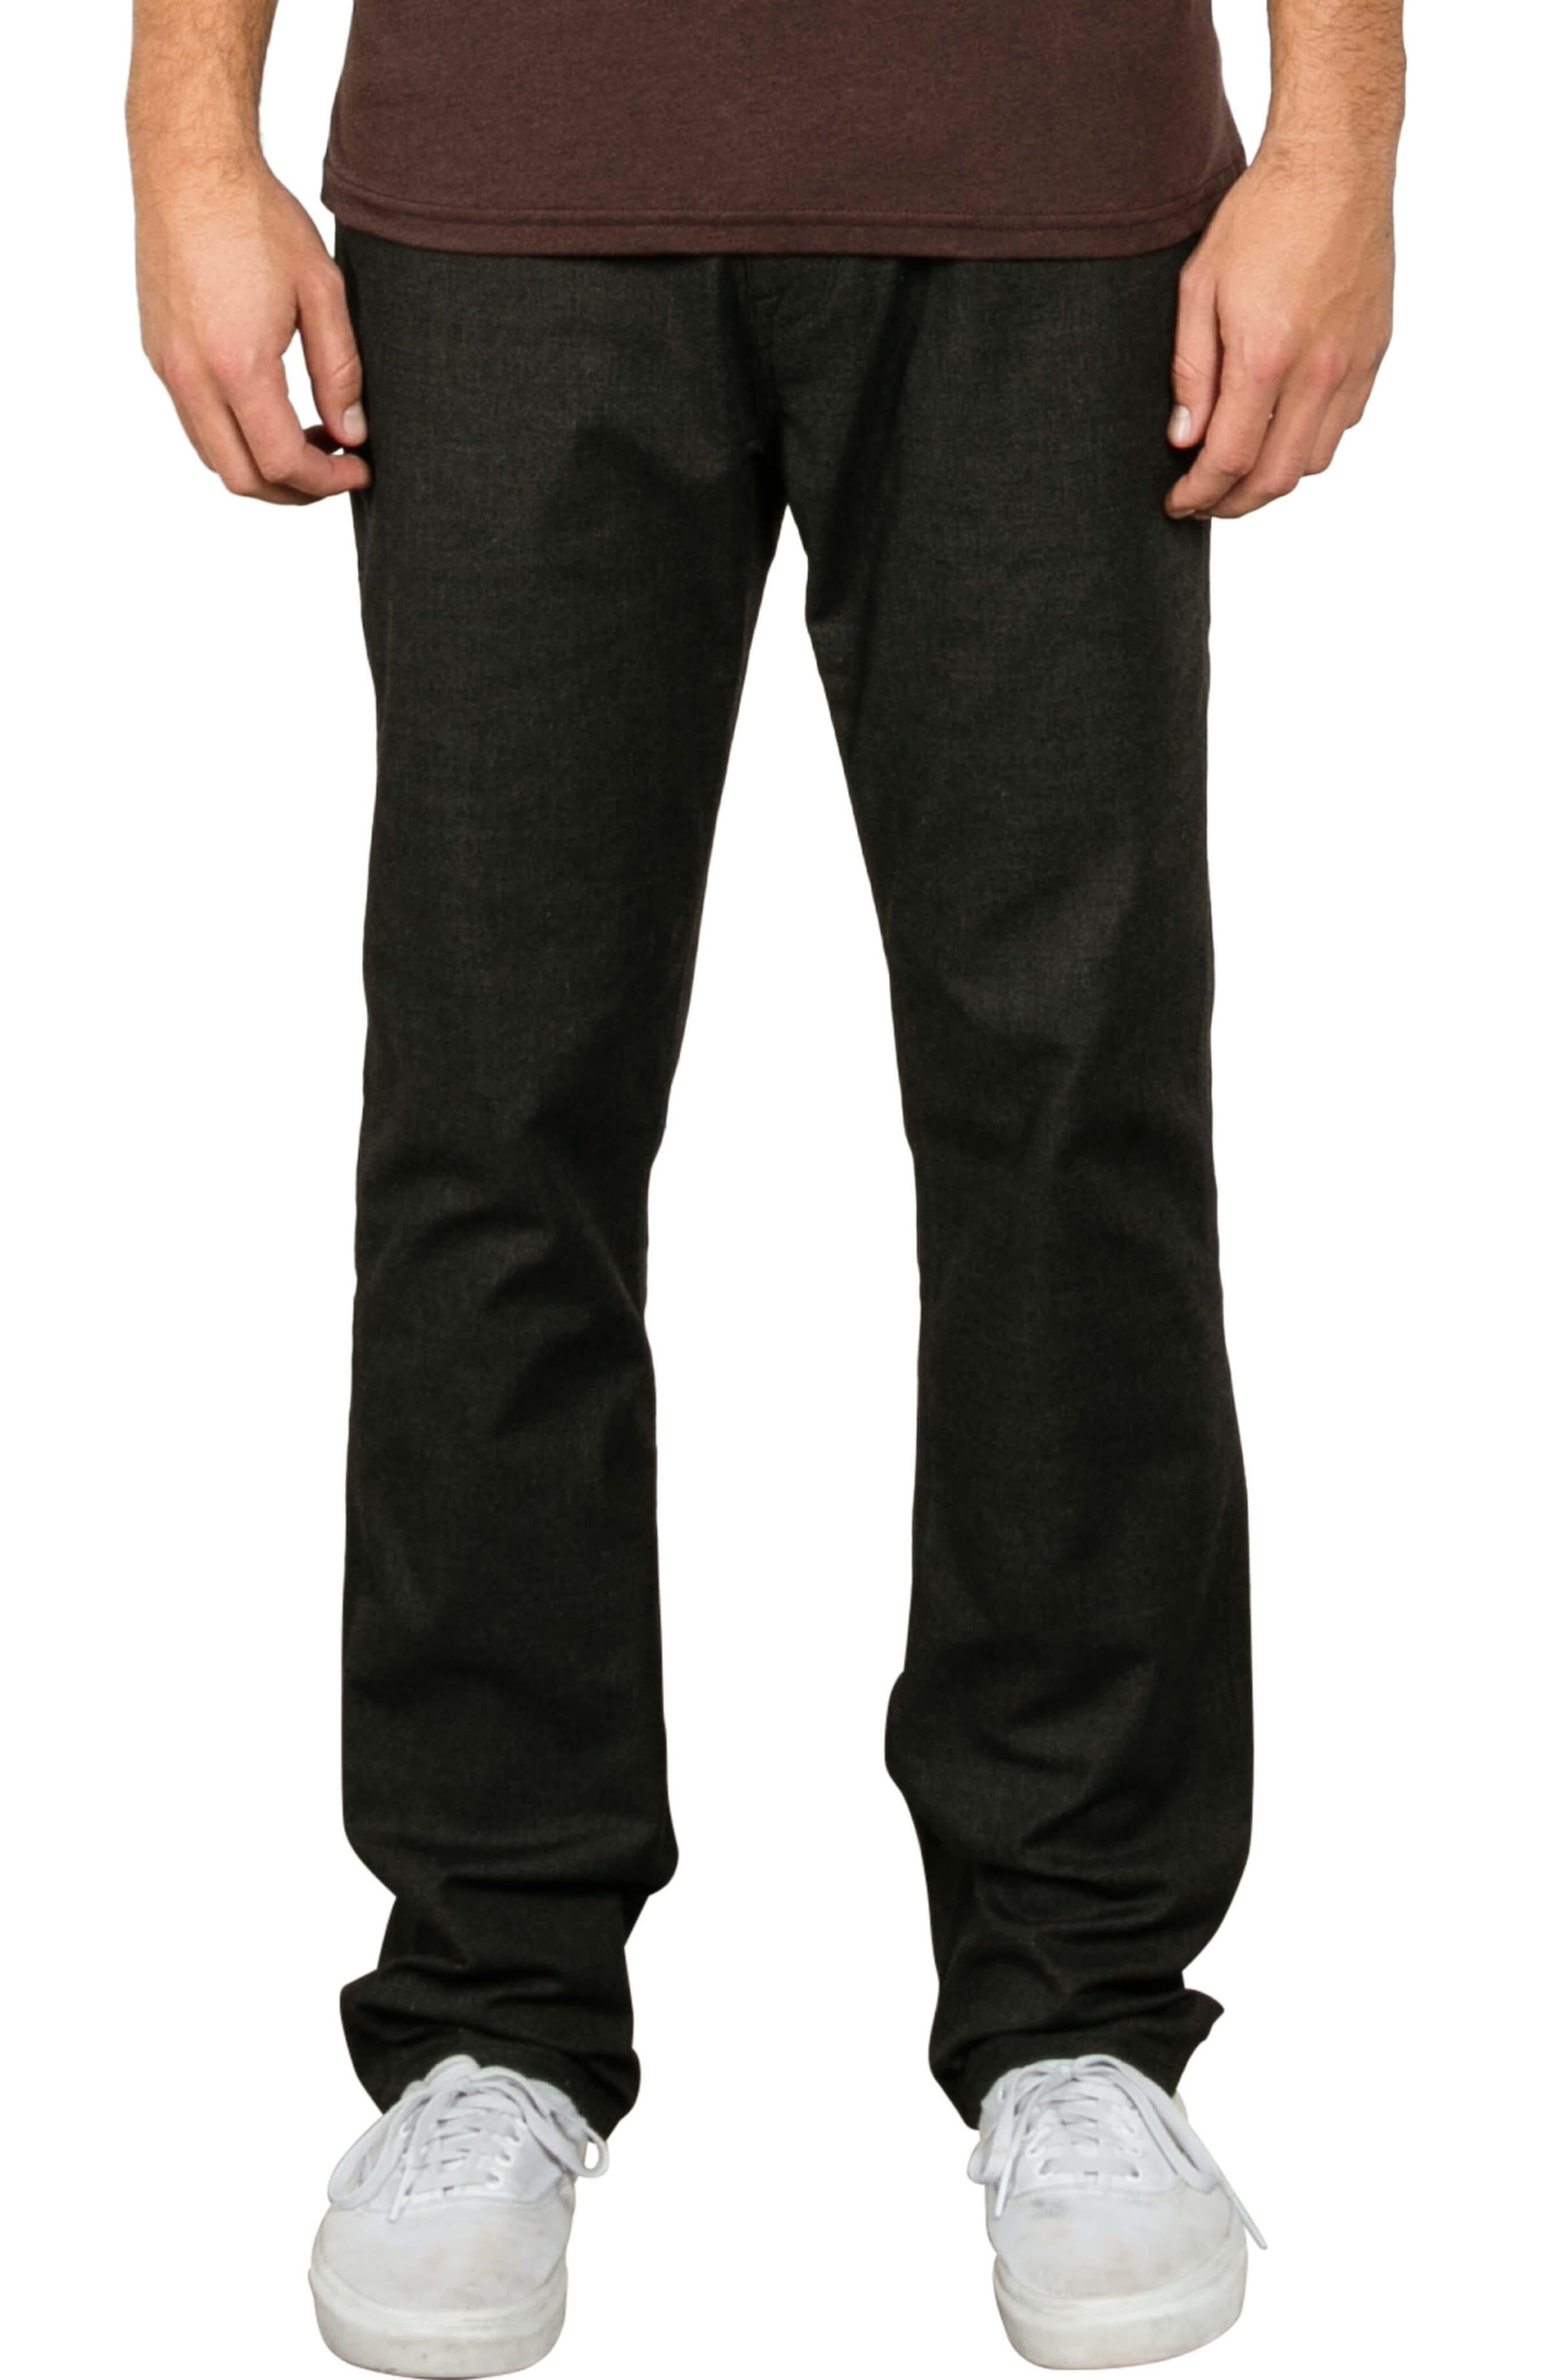 Gritter Modern Thrifter Pants,                             Main thumbnail 1, color,                             Grey Metal